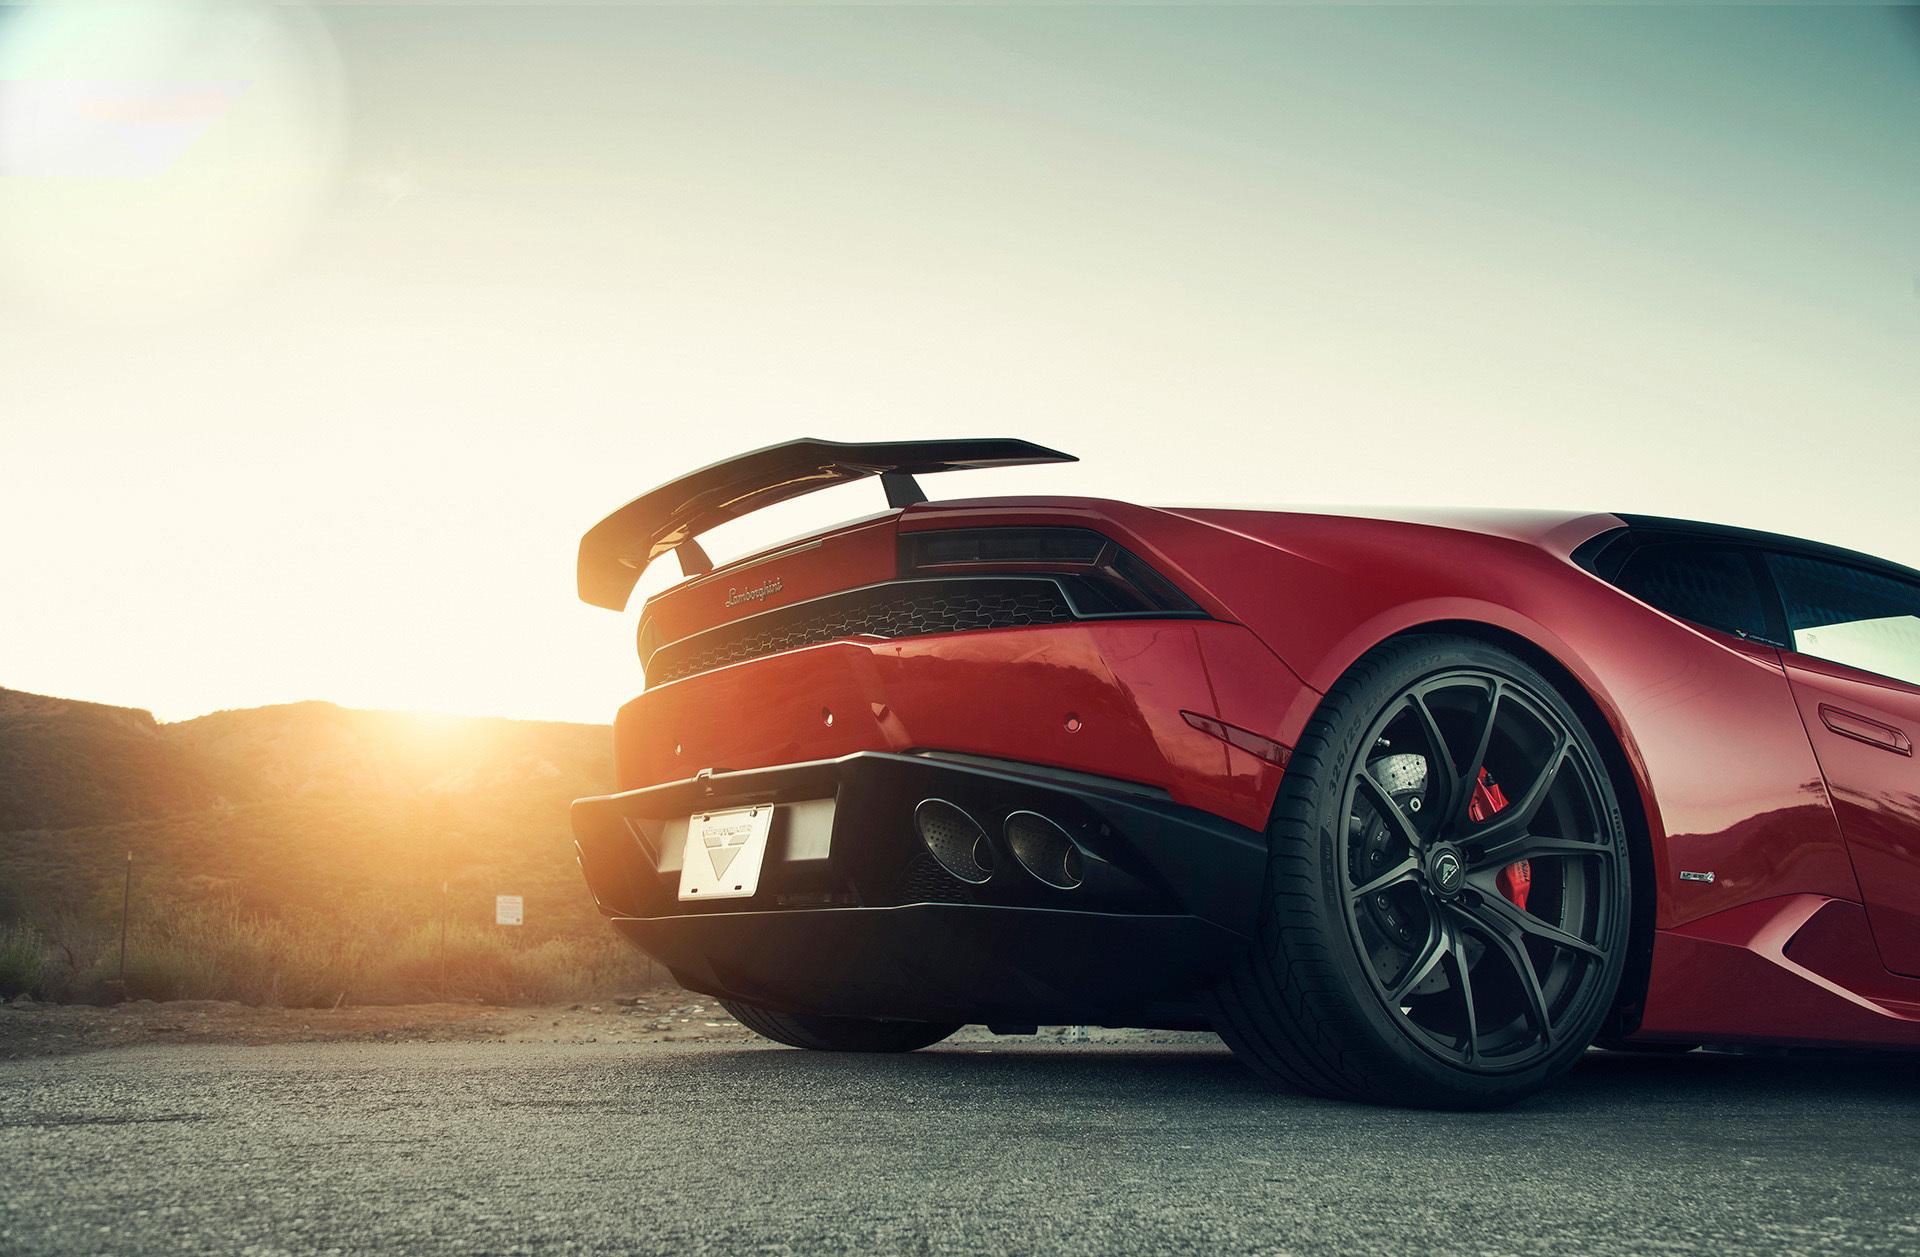 Vorsteiner Nero body kit for Lamborghini Huracan Verona new style